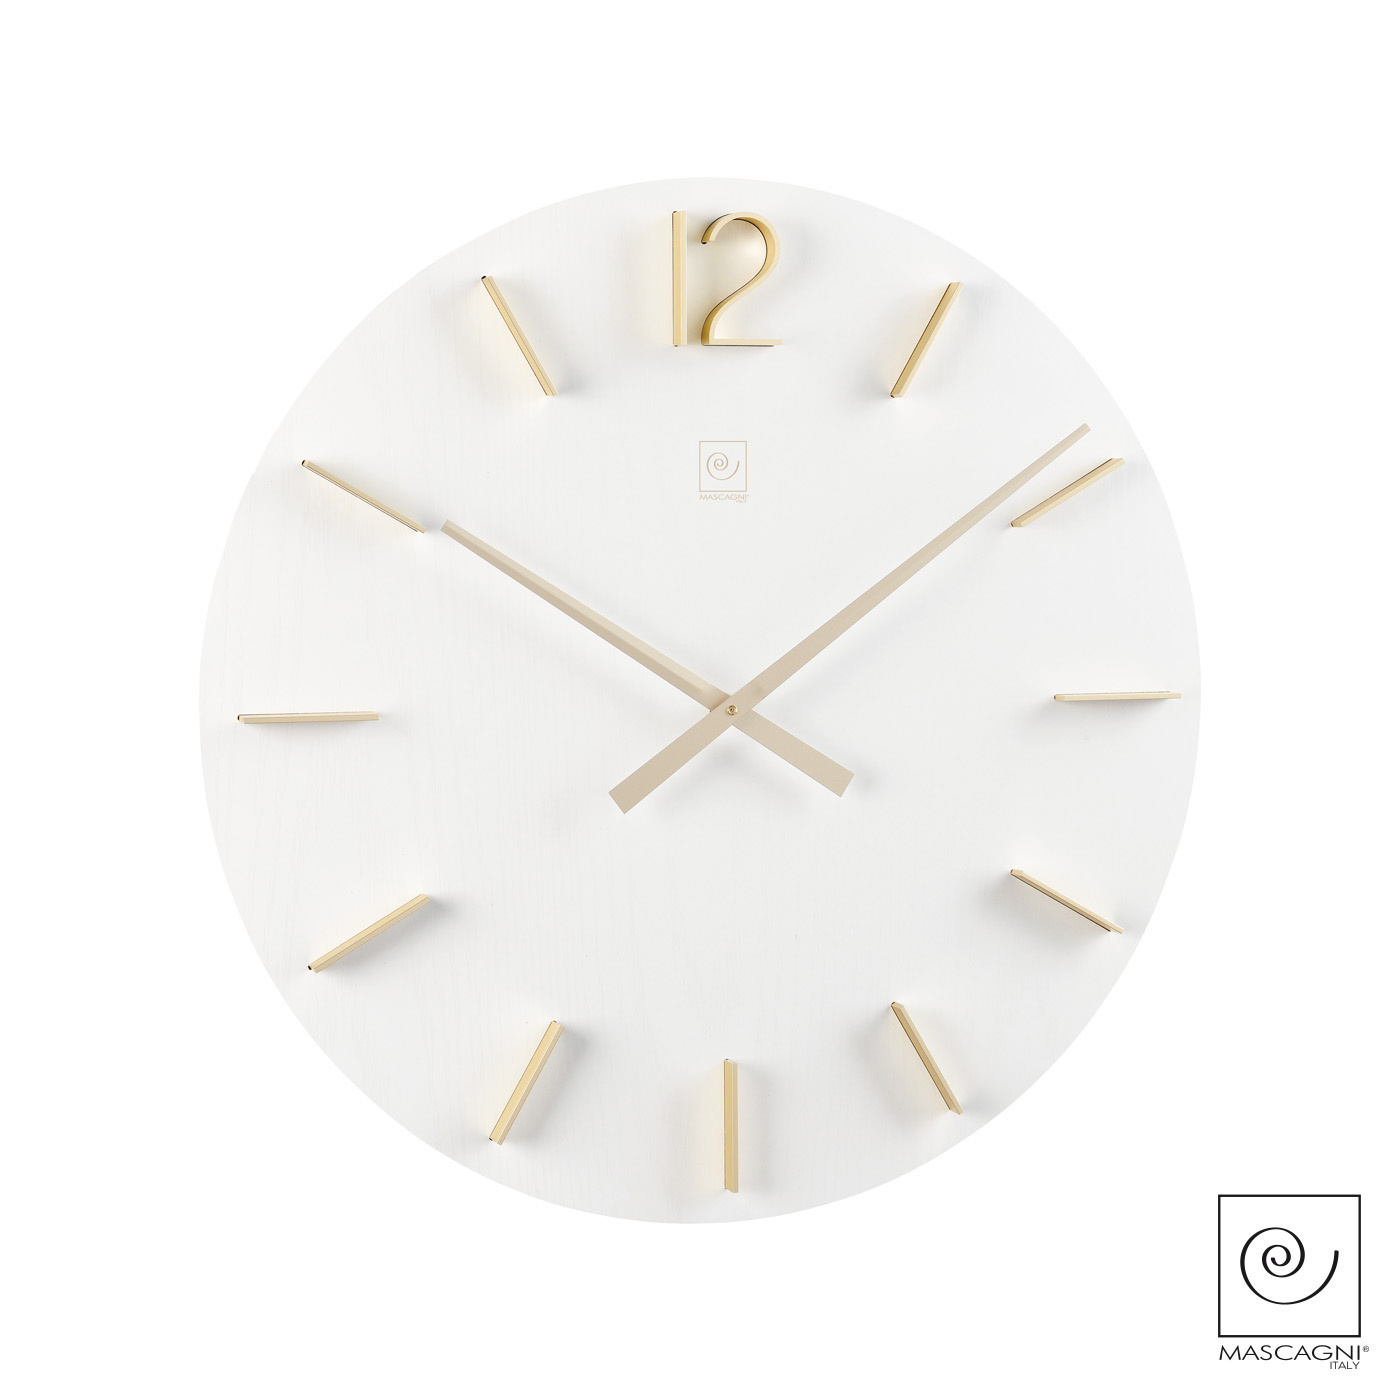 Art Mascagni M578 CLOCK DIAM.50 - COL.WHITE